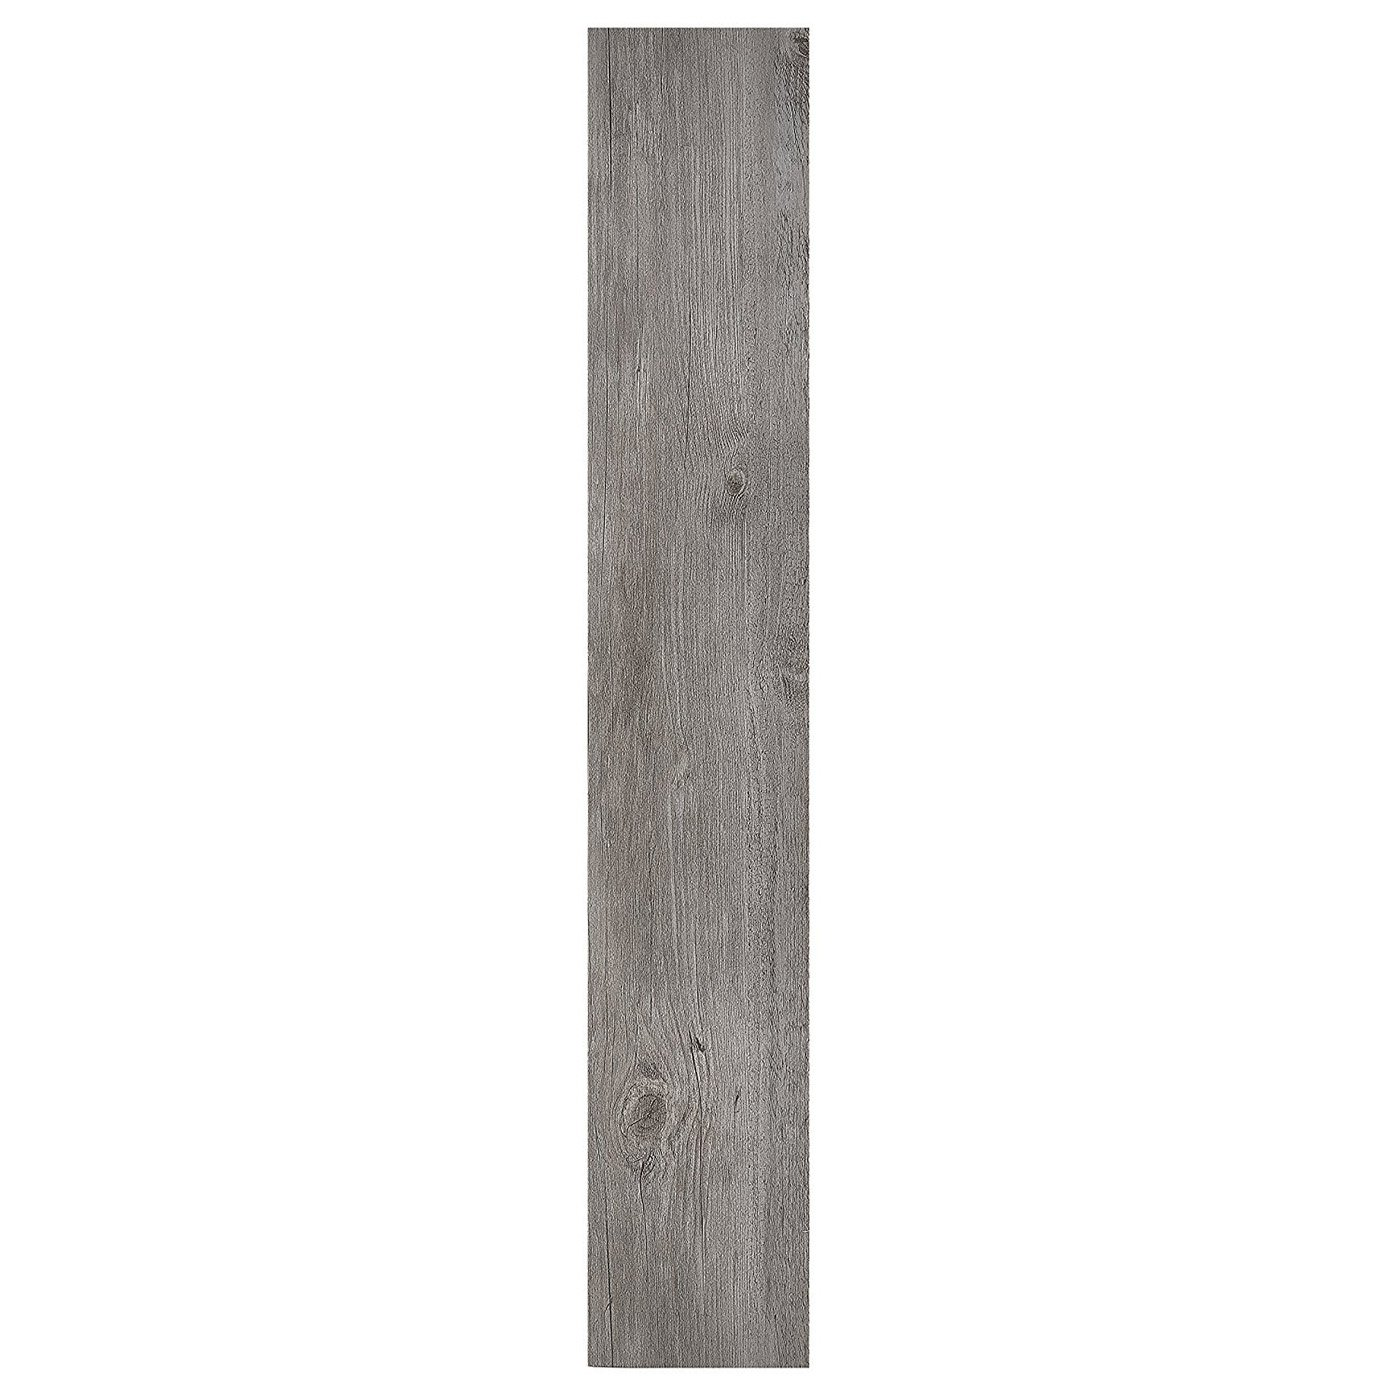 Achim Home Furnishings VFP1.2GO60 Achim Home Imports Nexus Light Grey Oak 6x36 Self Adhesive Vinyl Floor Planks Planks/90 Sq Ft, 60 Pack by Achim Home Furnishings